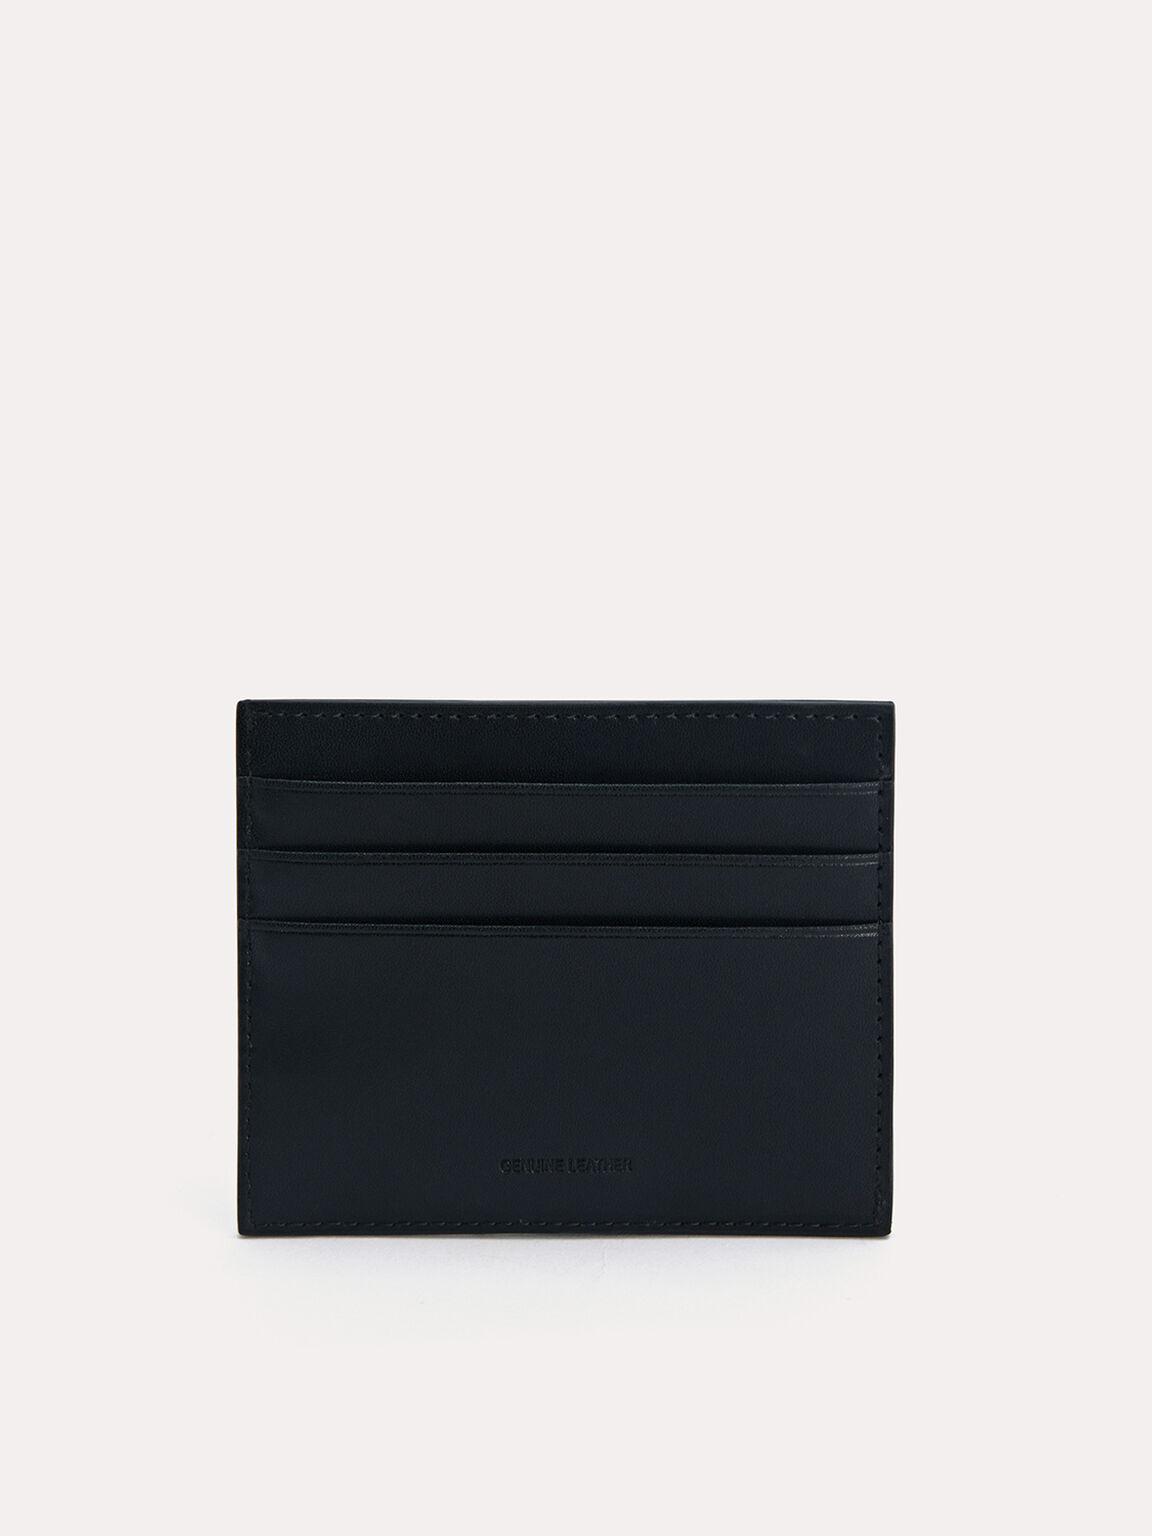 Two-Tone Leather Cardholder, Black, hi-res